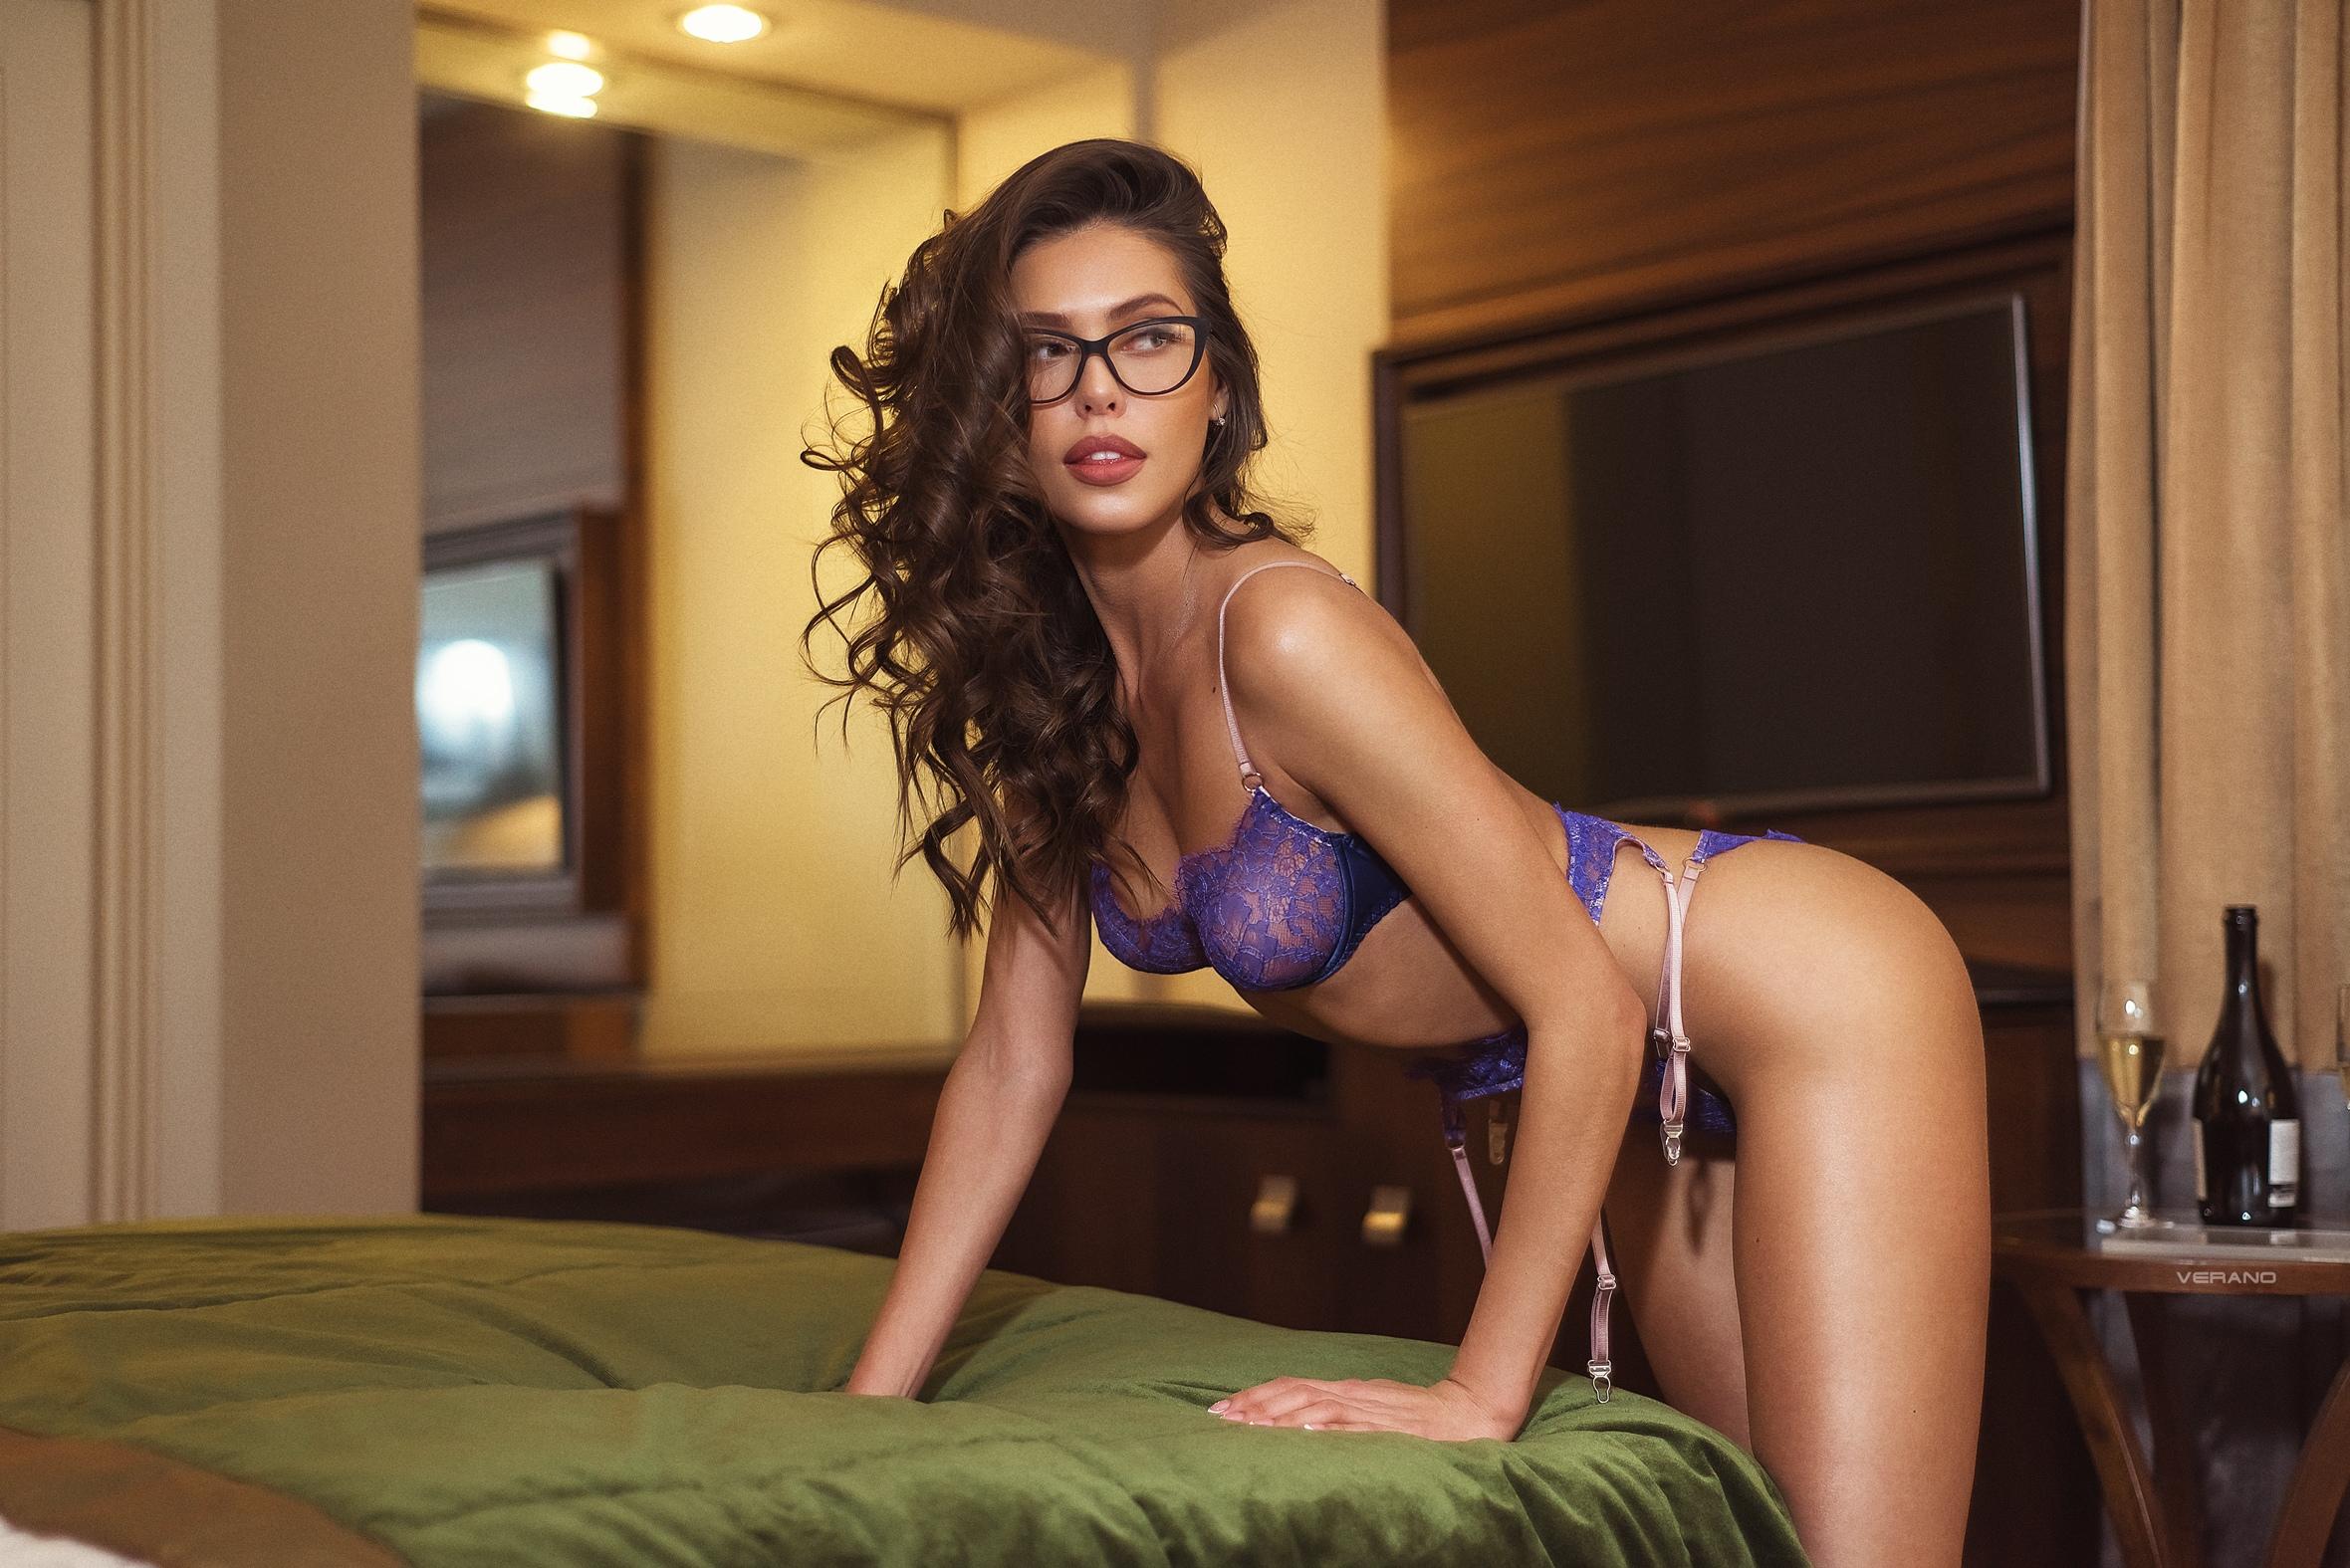 Erotica Katerina Sozinova nudes (84 pictures) Video, 2018, cameltoe